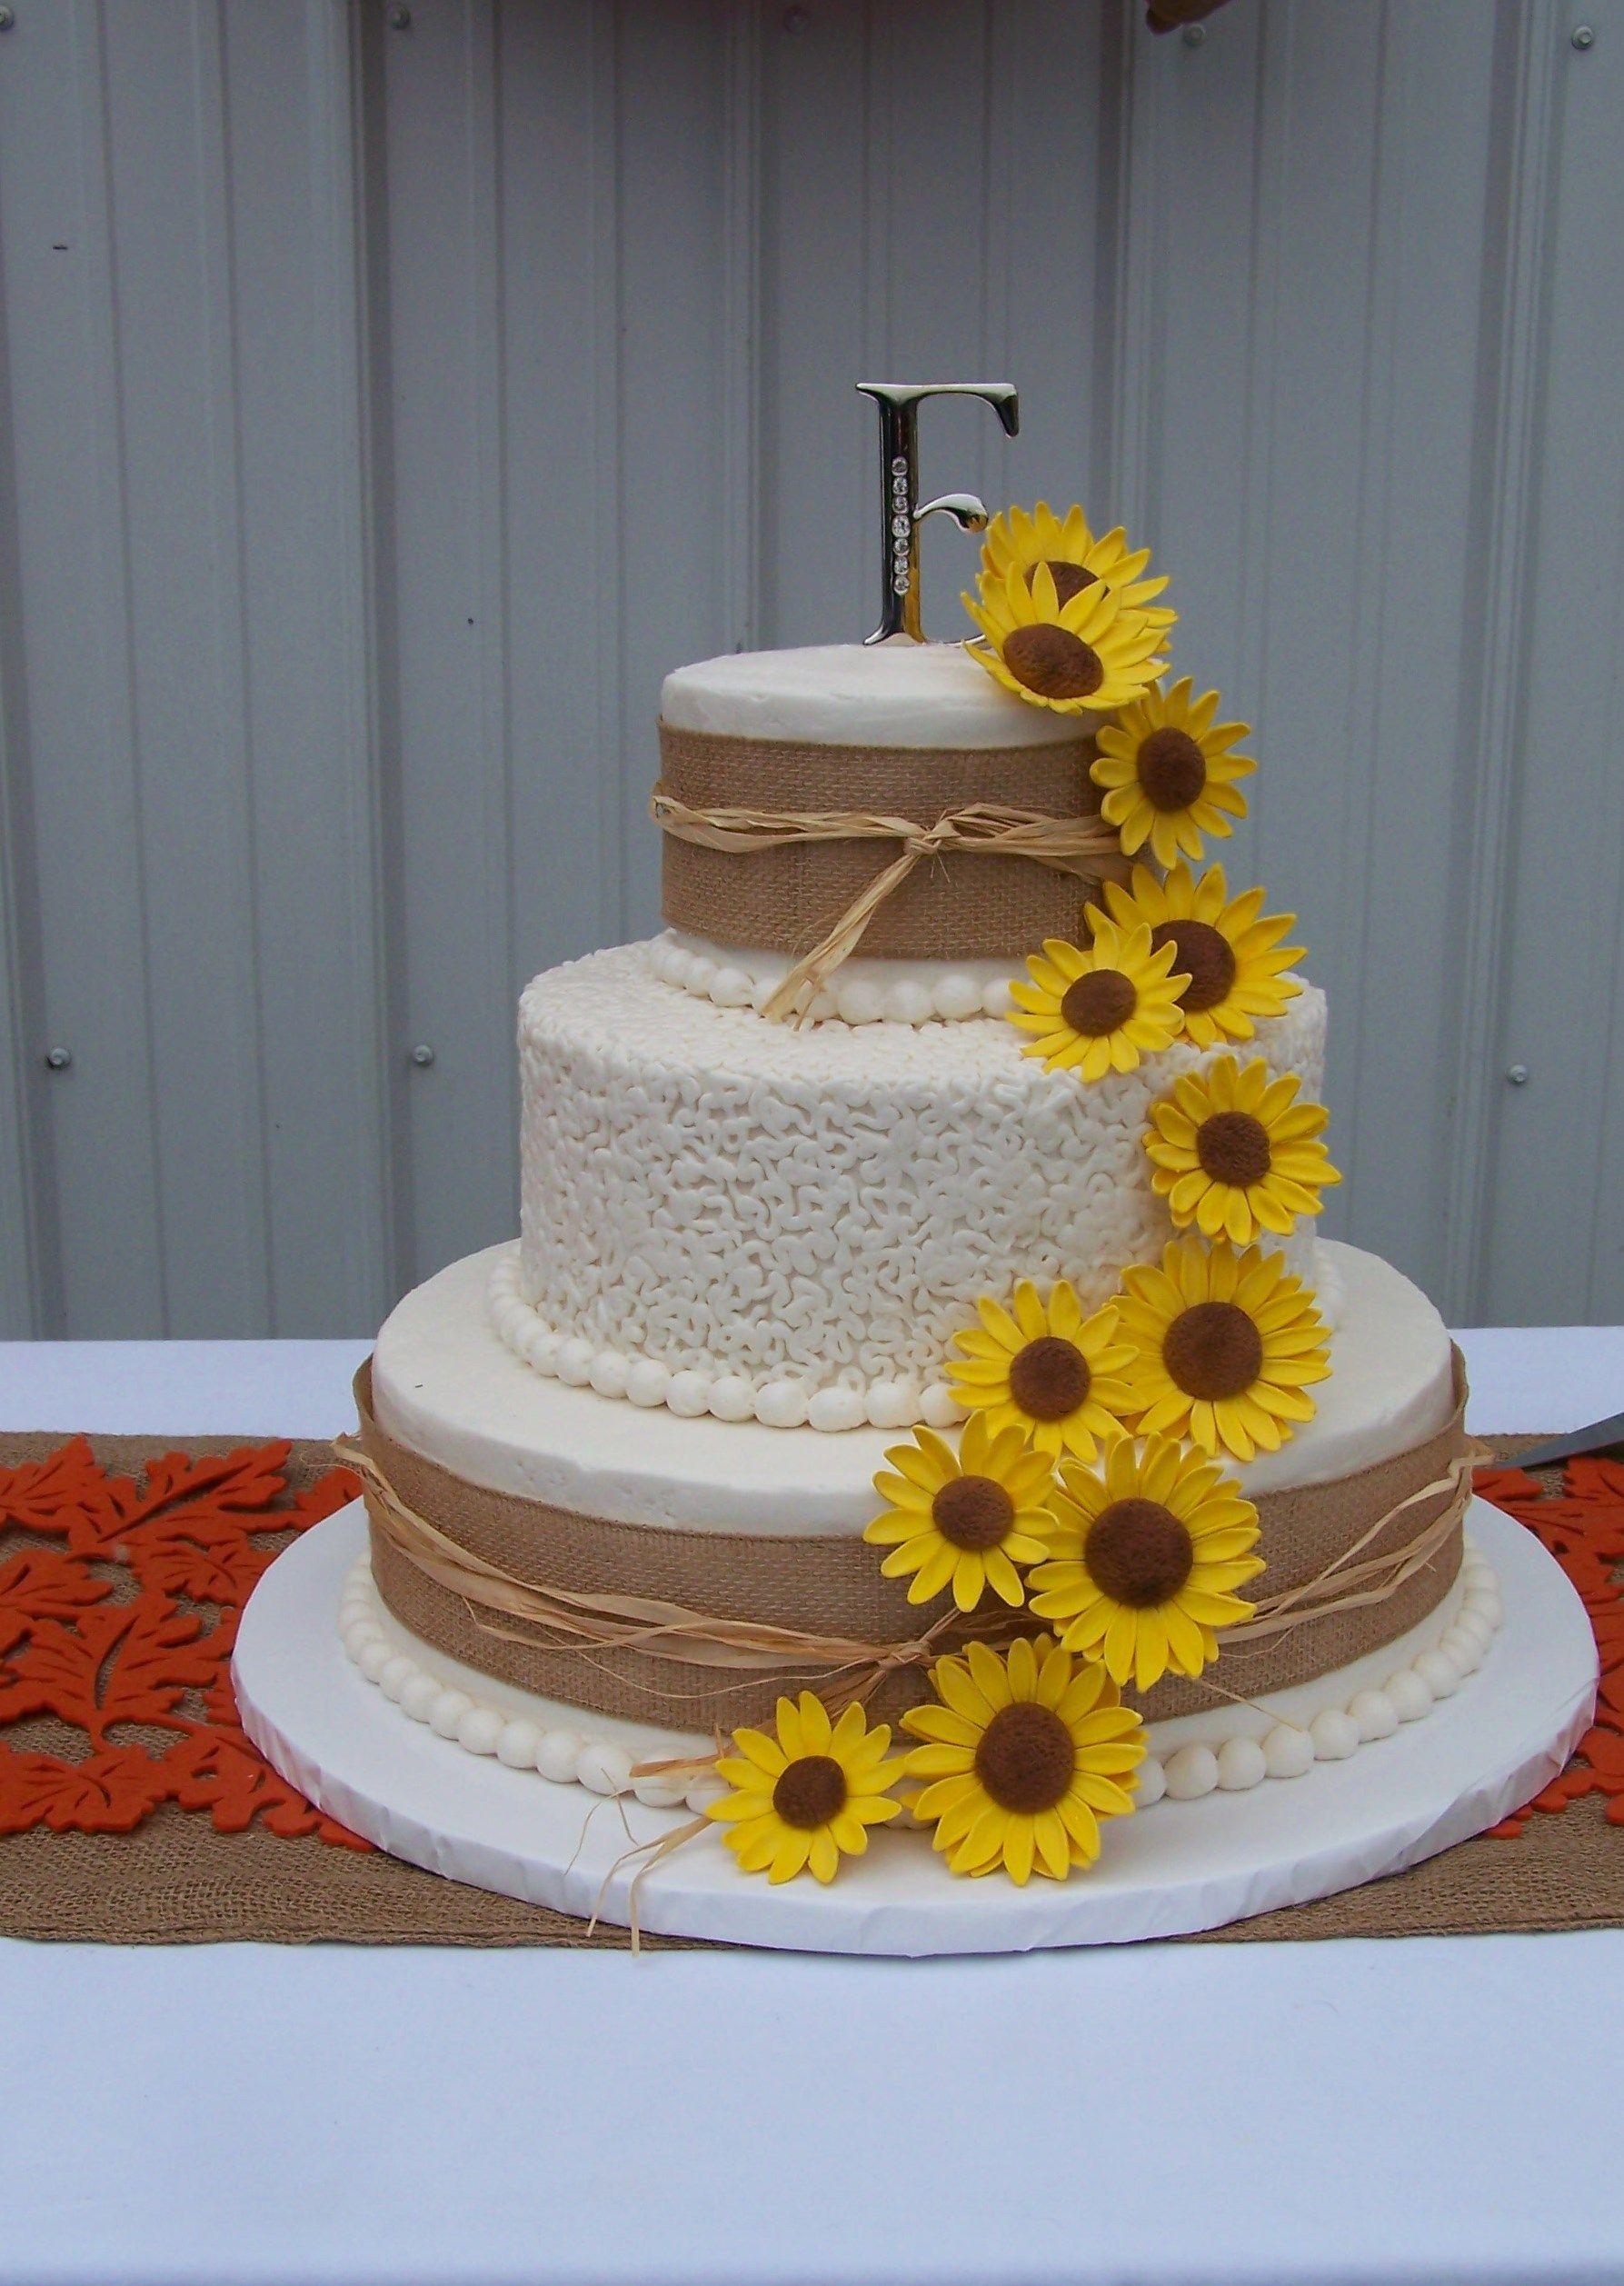 Rustic Sunflowers Wedding Cake